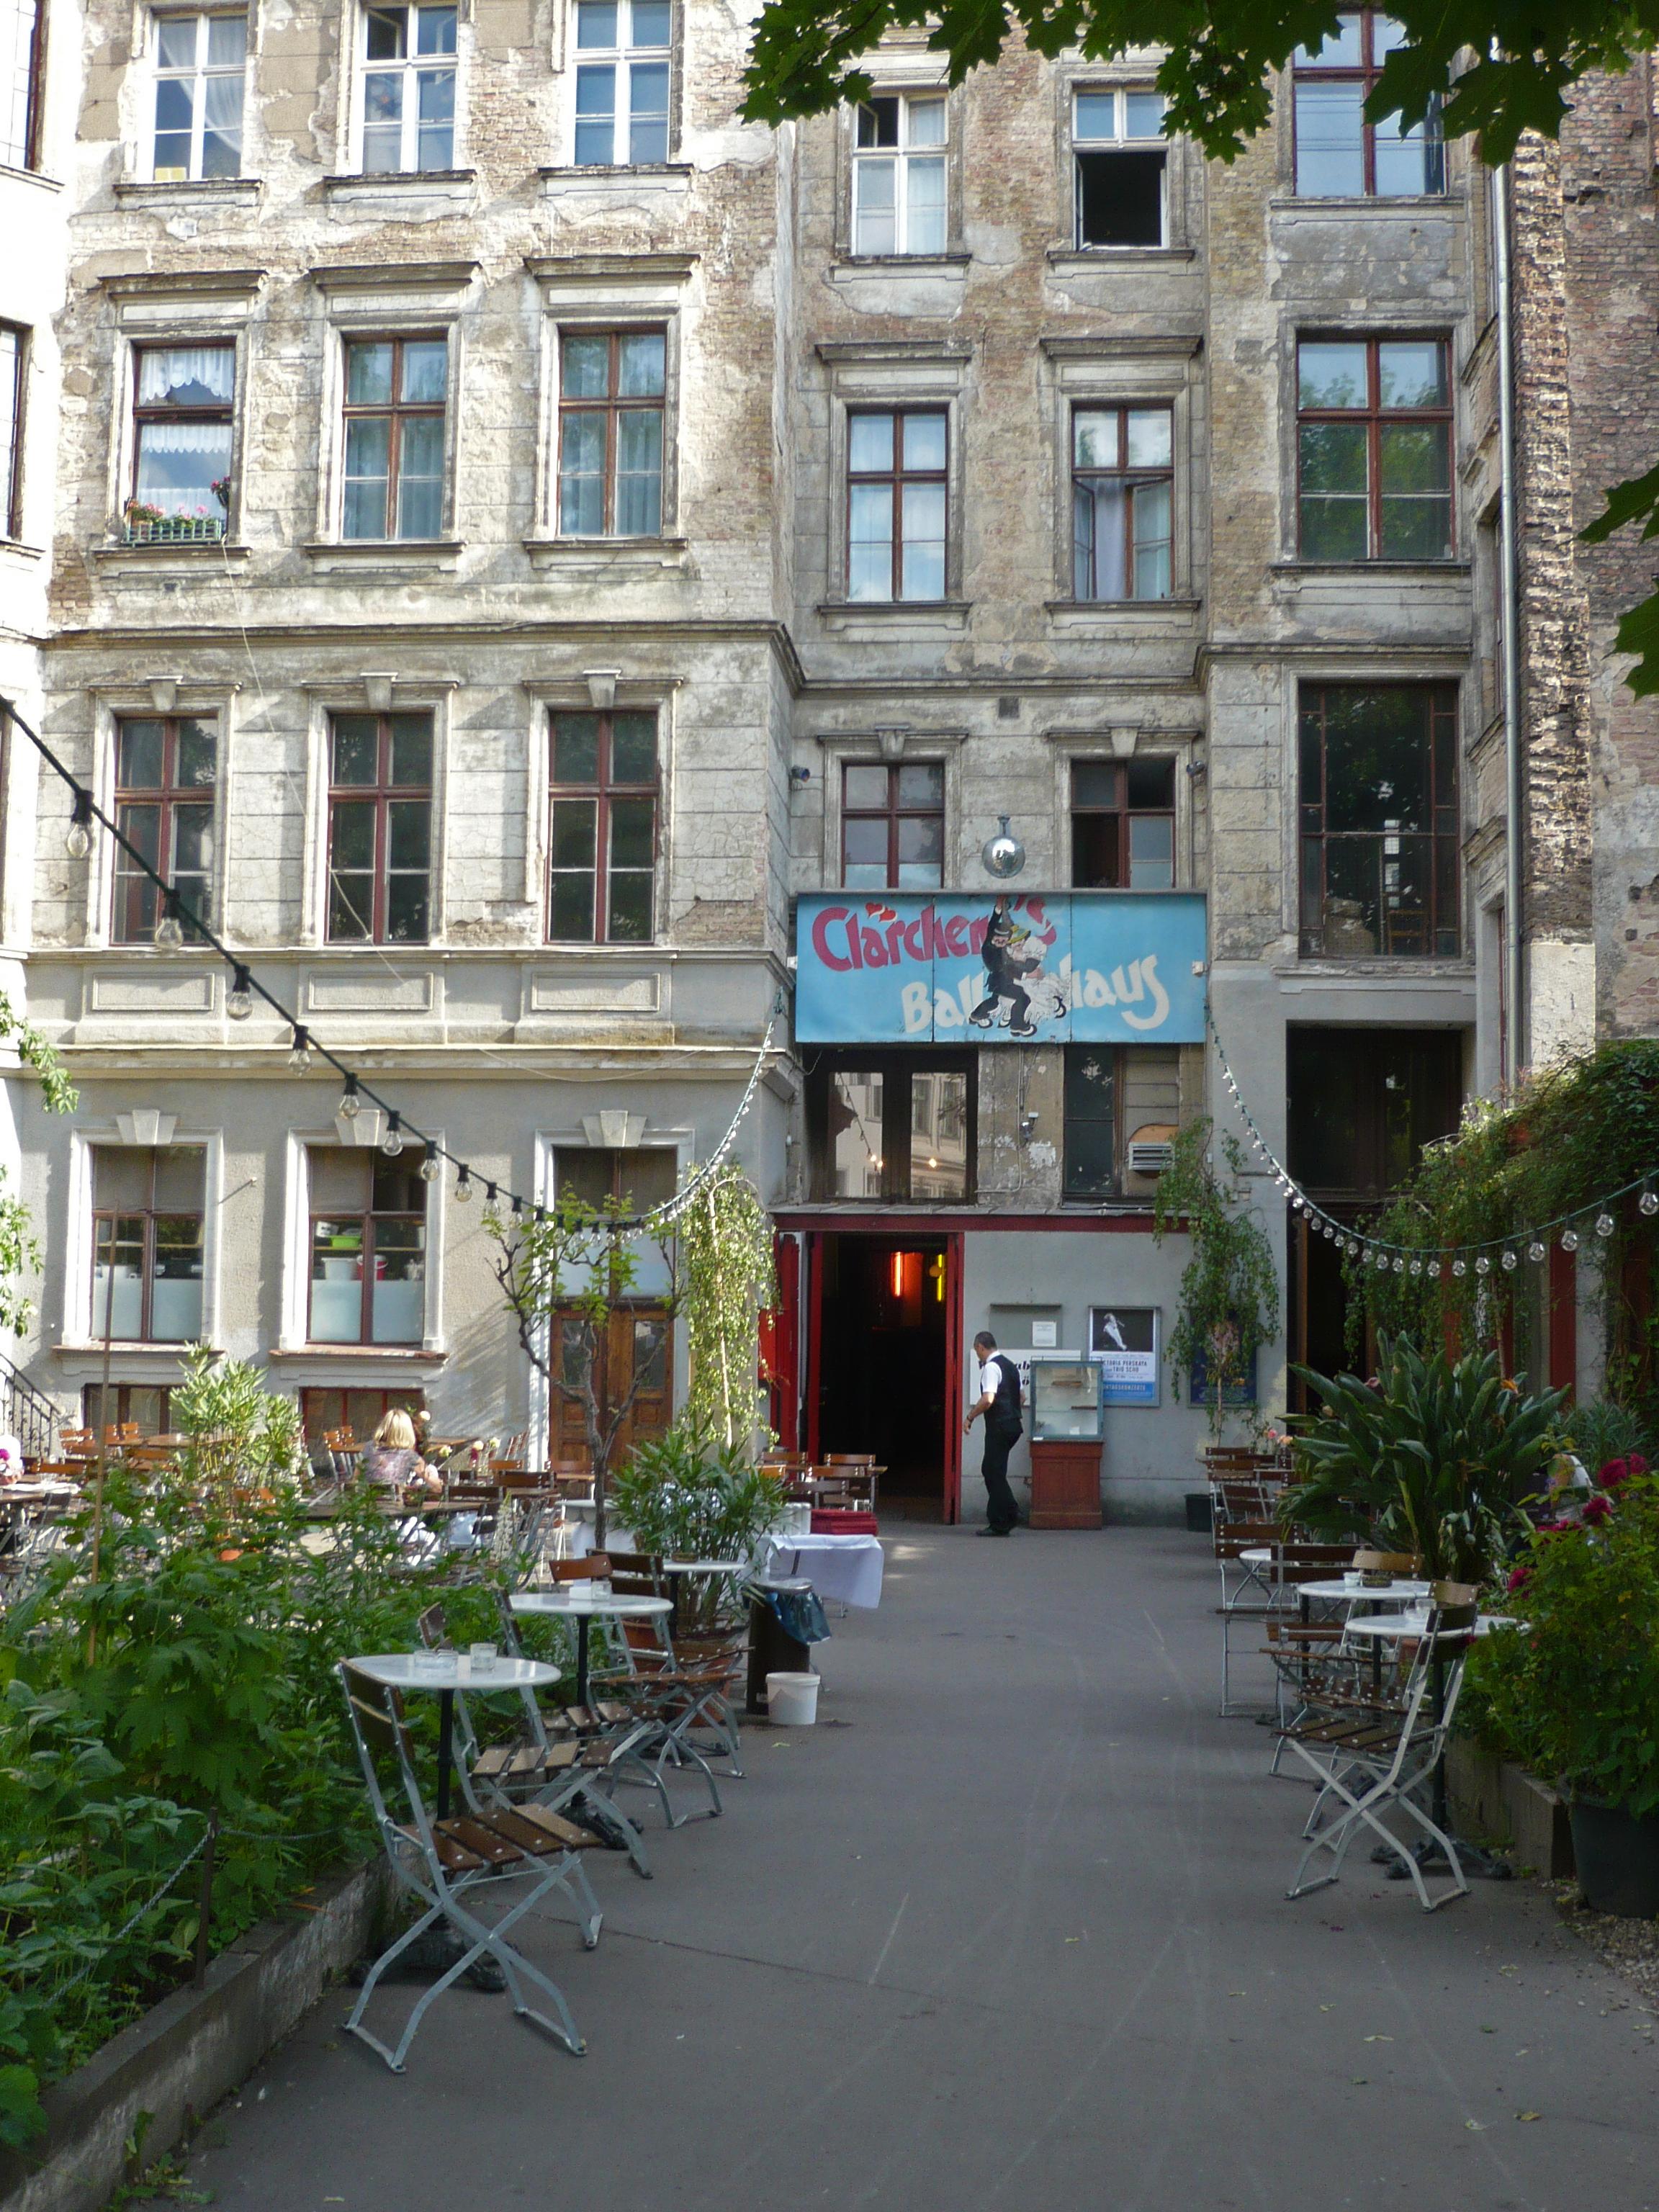 Clärchens Ballhaus. Foto: Per Gadegaard